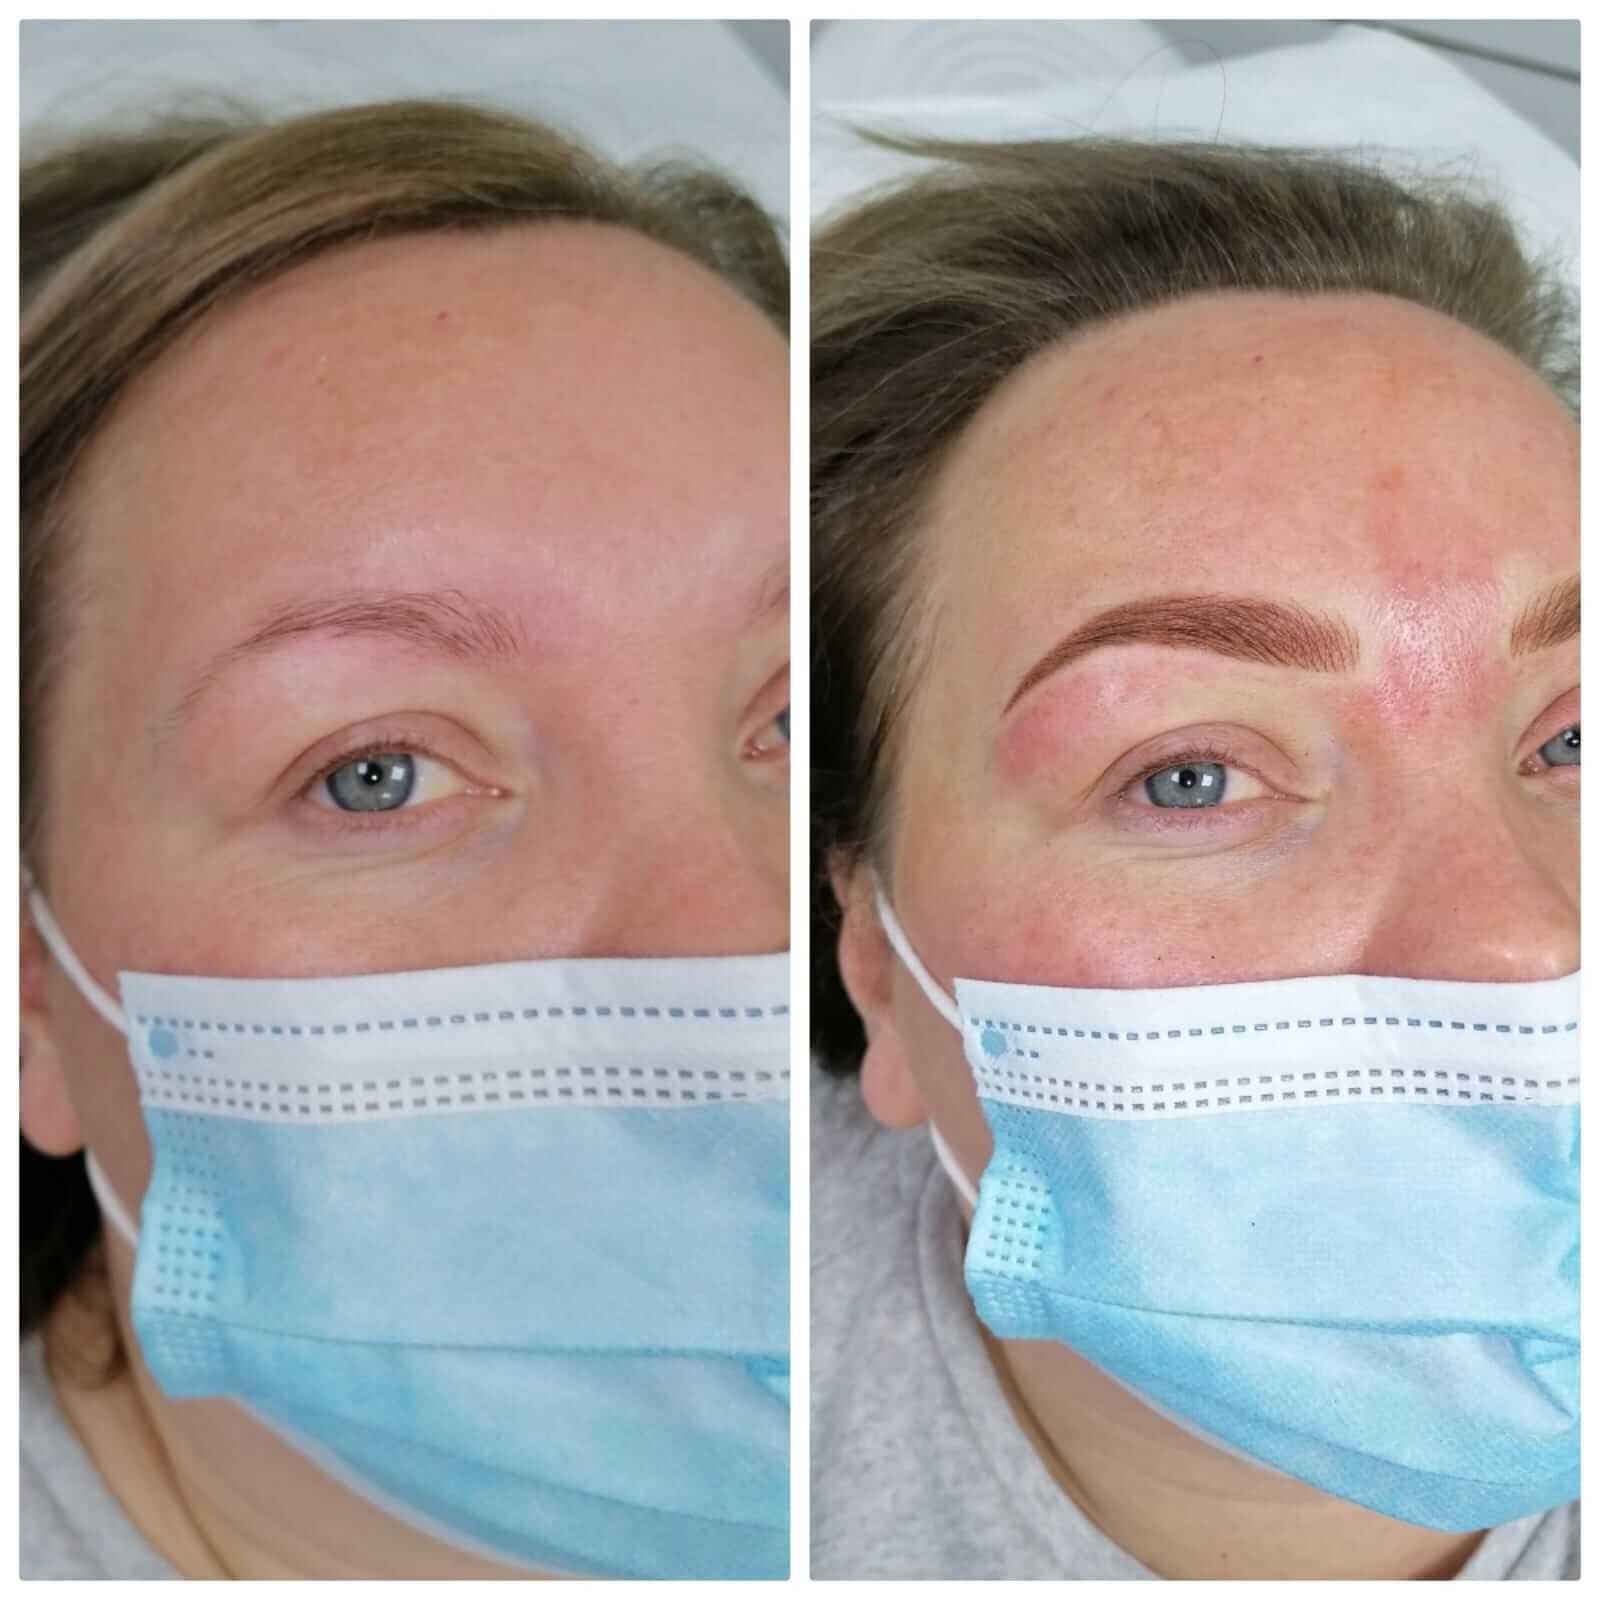 Semi Permanent Make-up Results - Eyebrows 4